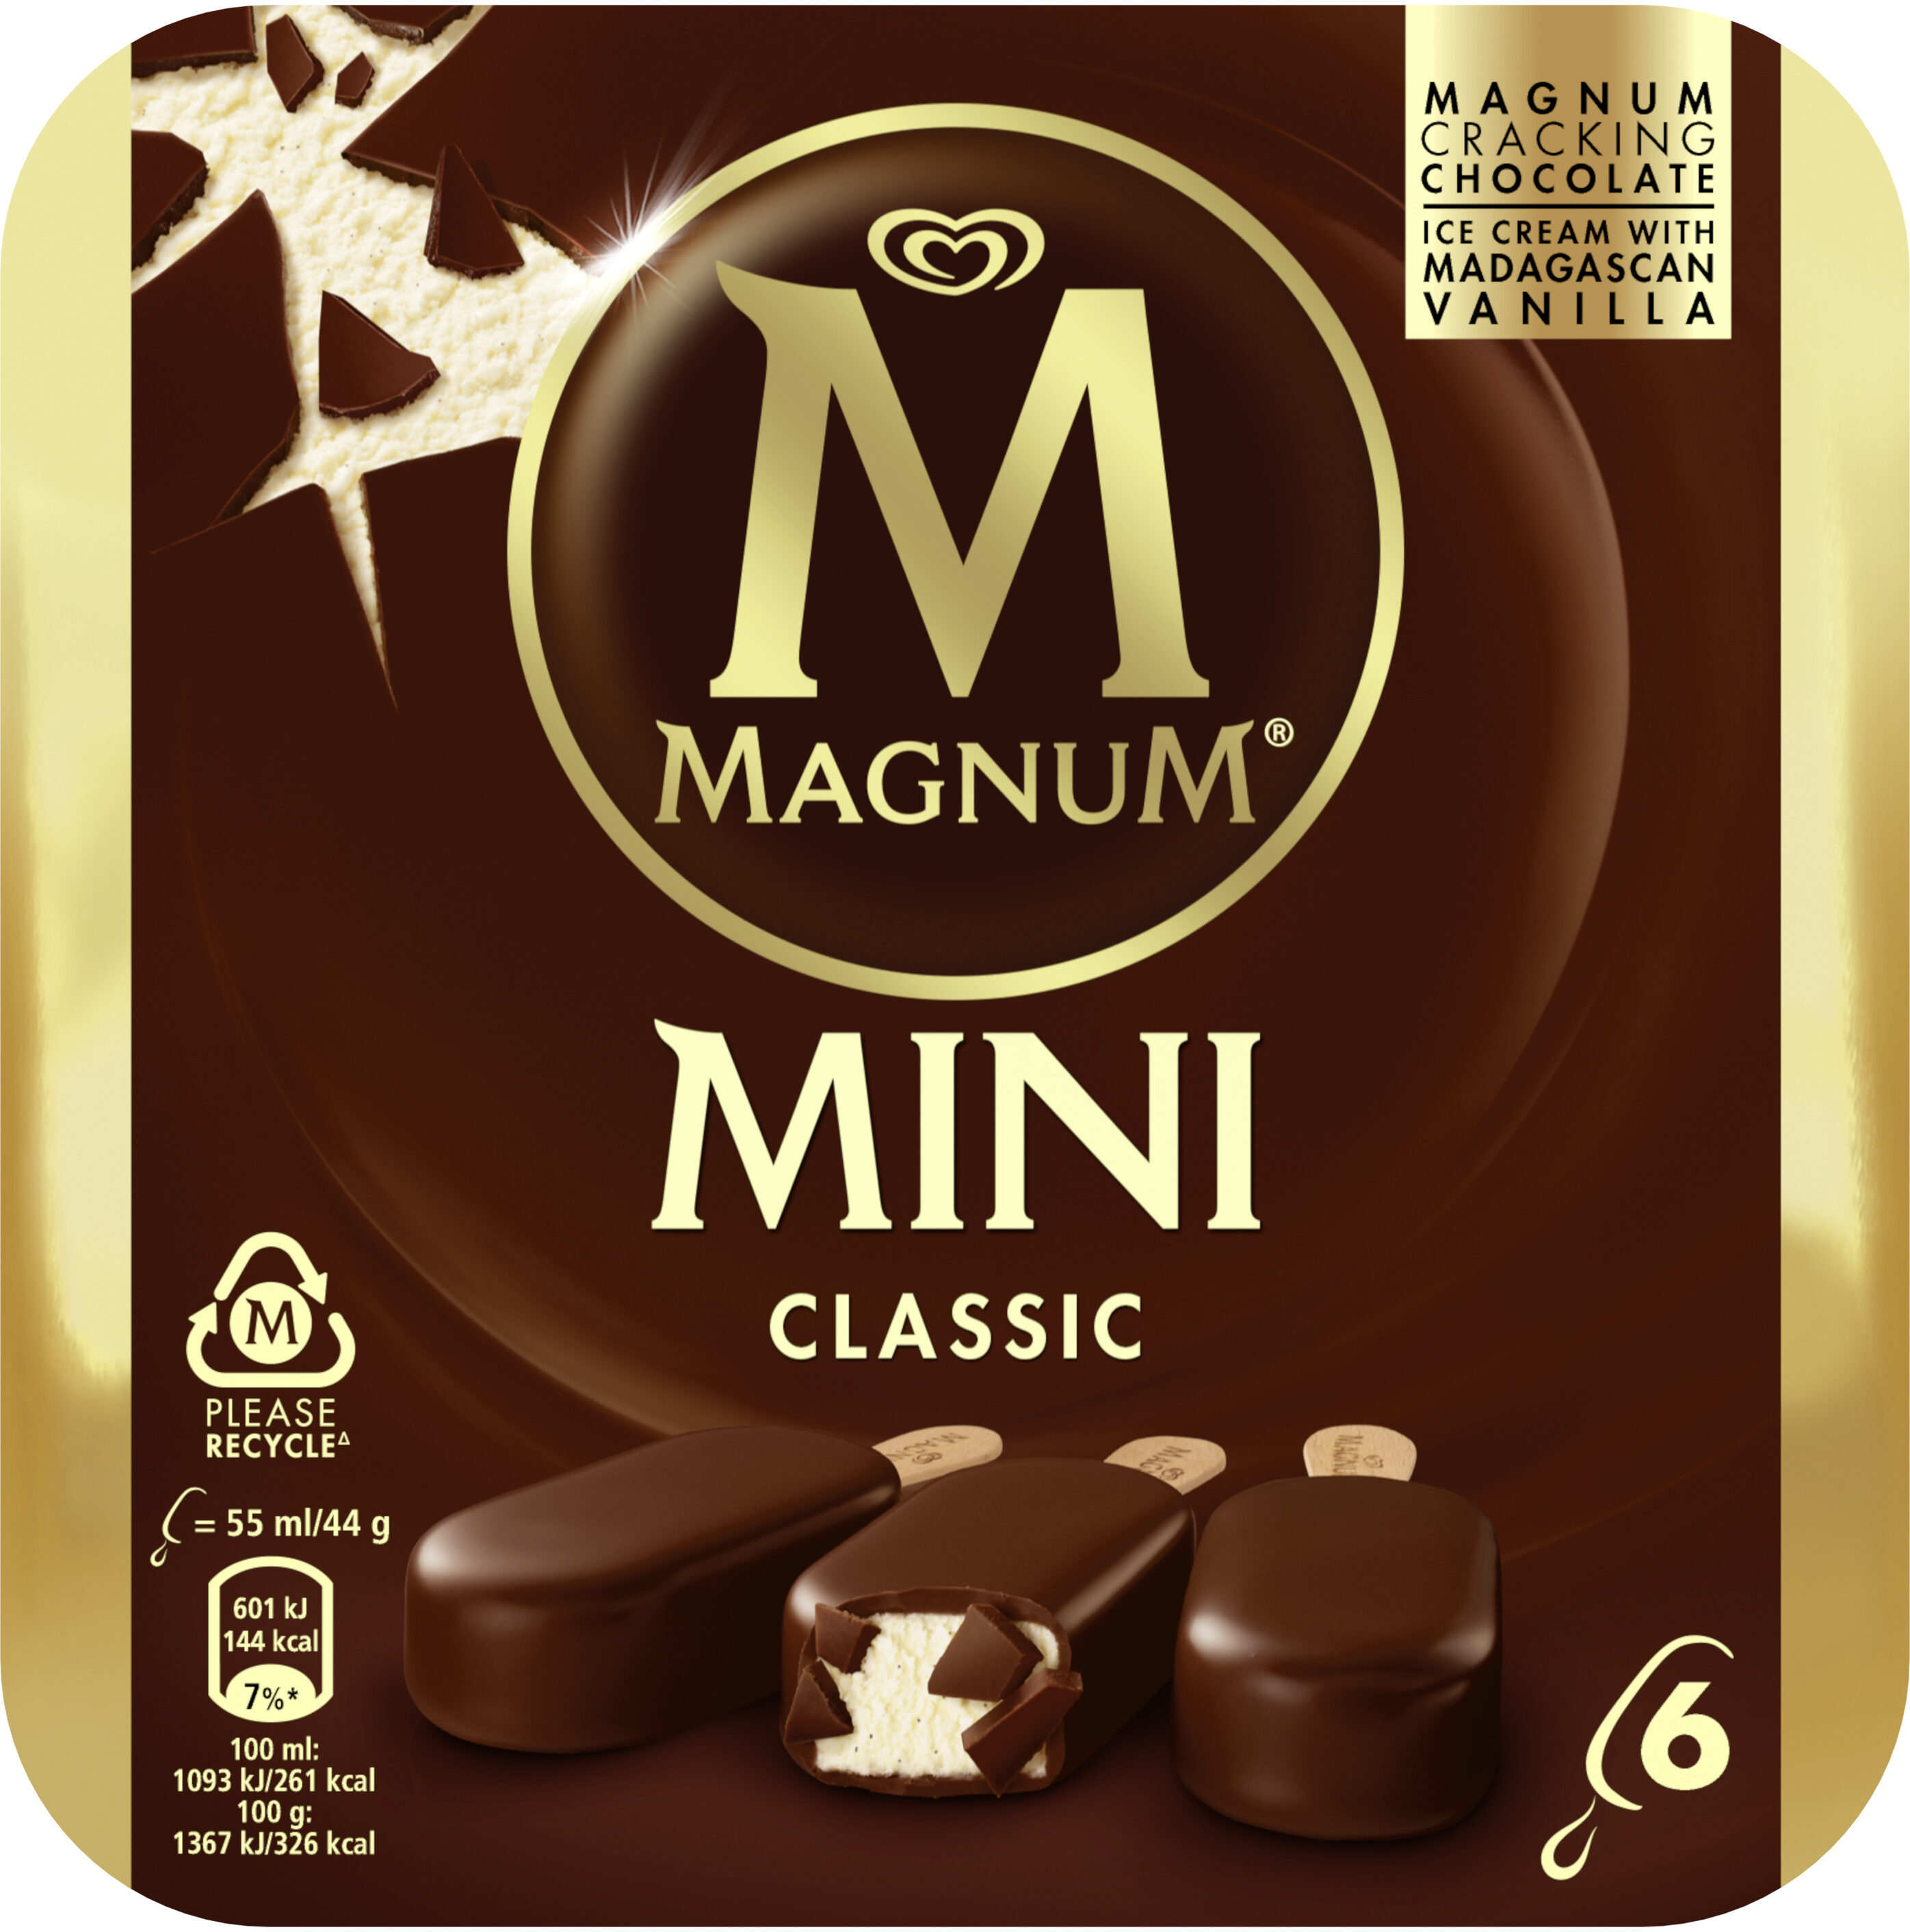 Magnum Glace Bâtonnet Mini Classic x6 330ml - Produto - fr